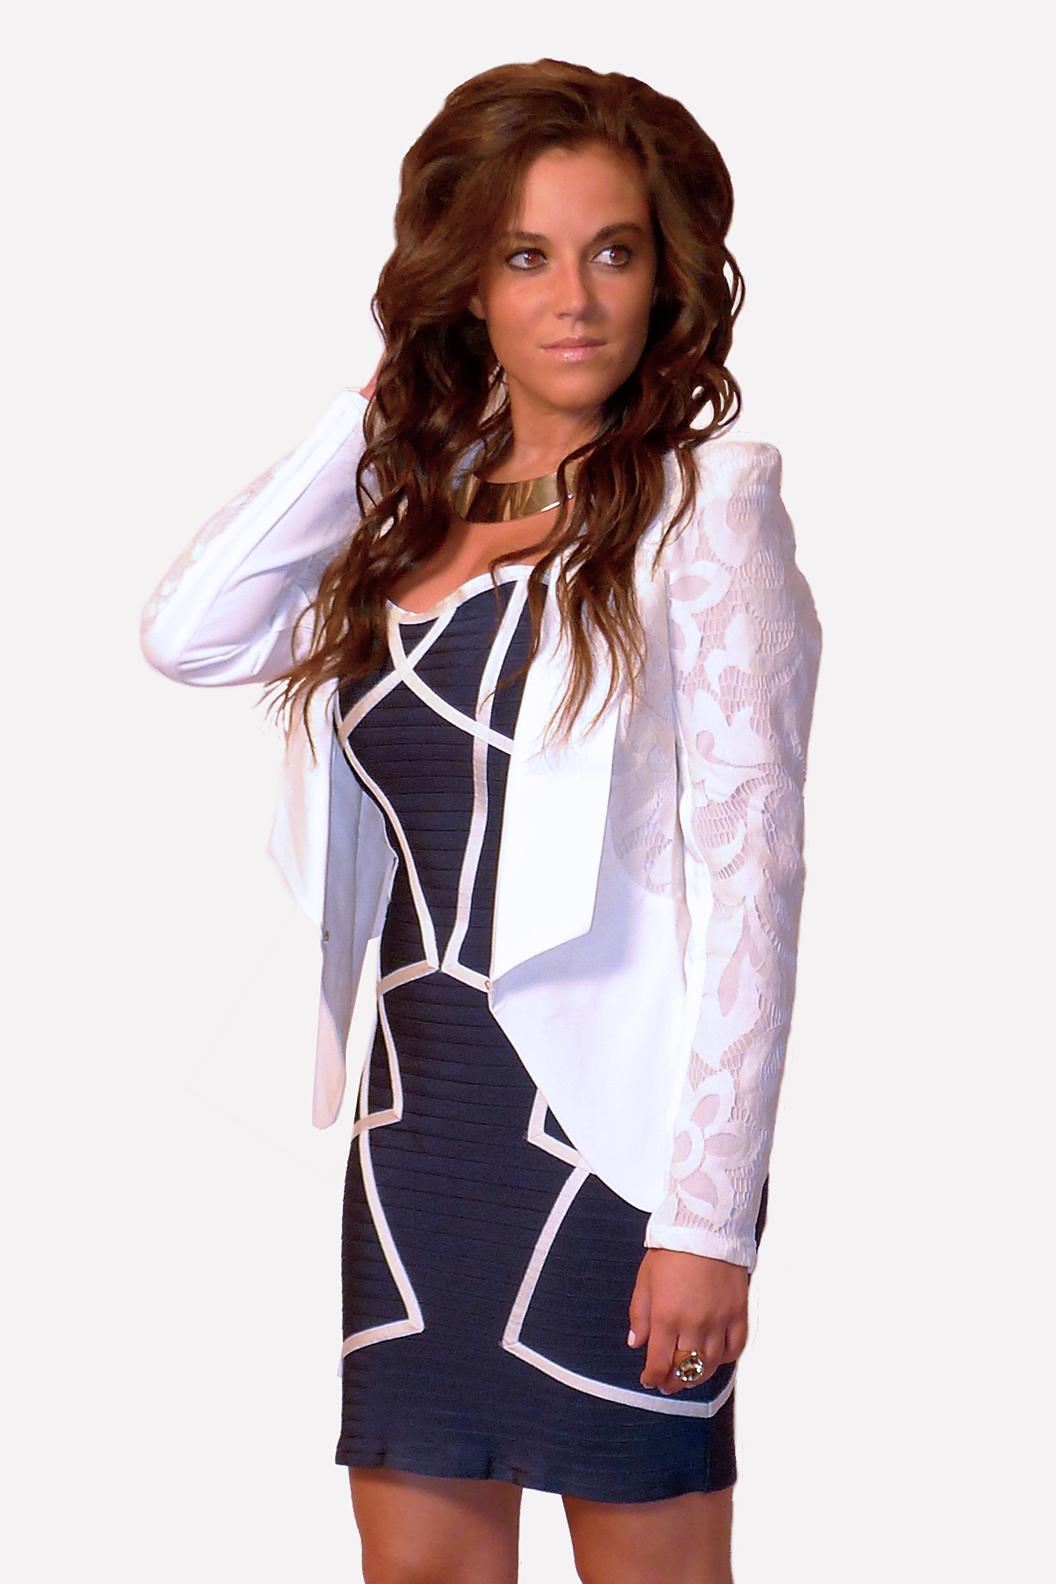 Wow Couture, Bandage Dress Blue w Ivory Trim